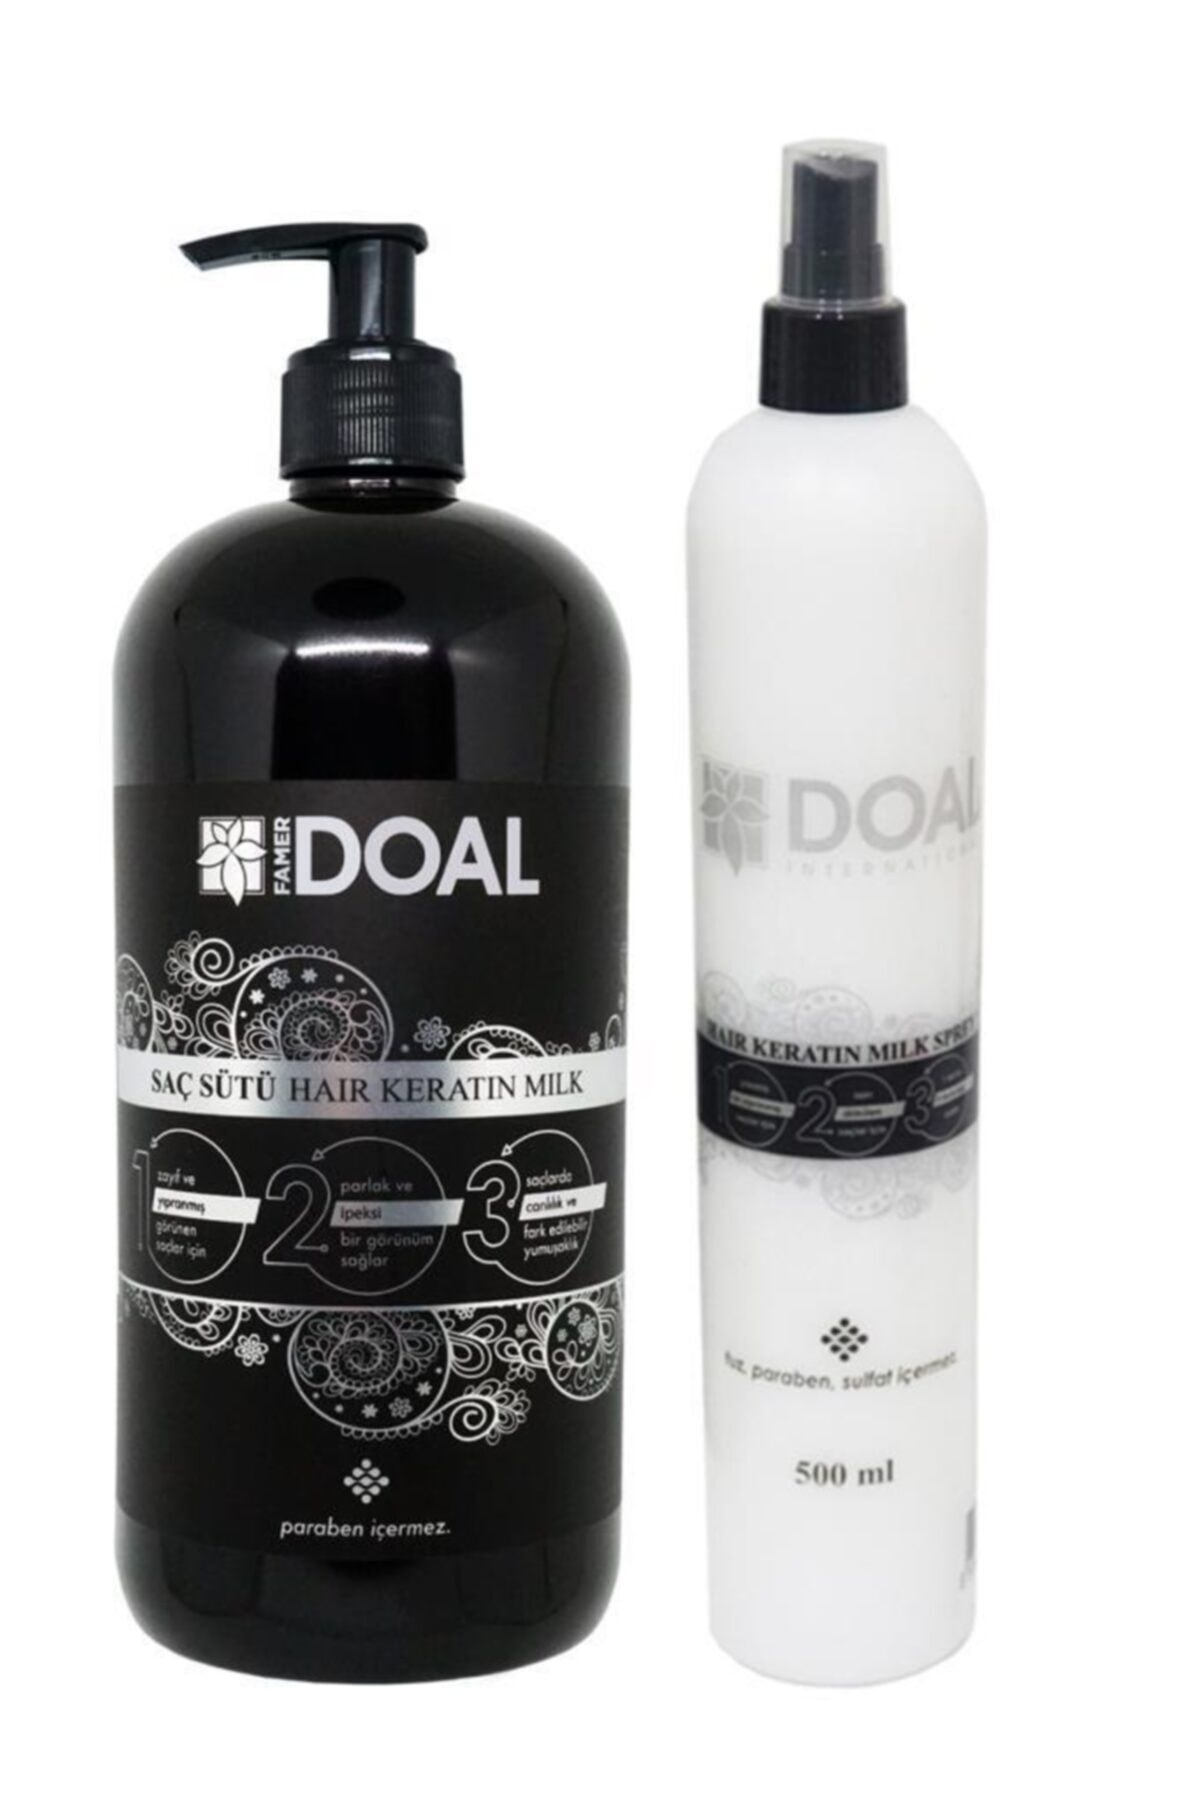 Keratin Treatment Milk Hair Care 1000 ML + Keratin Milk Spray 500 ML DOAL Damaged And Weak Hair   Bright And Smooth Repair